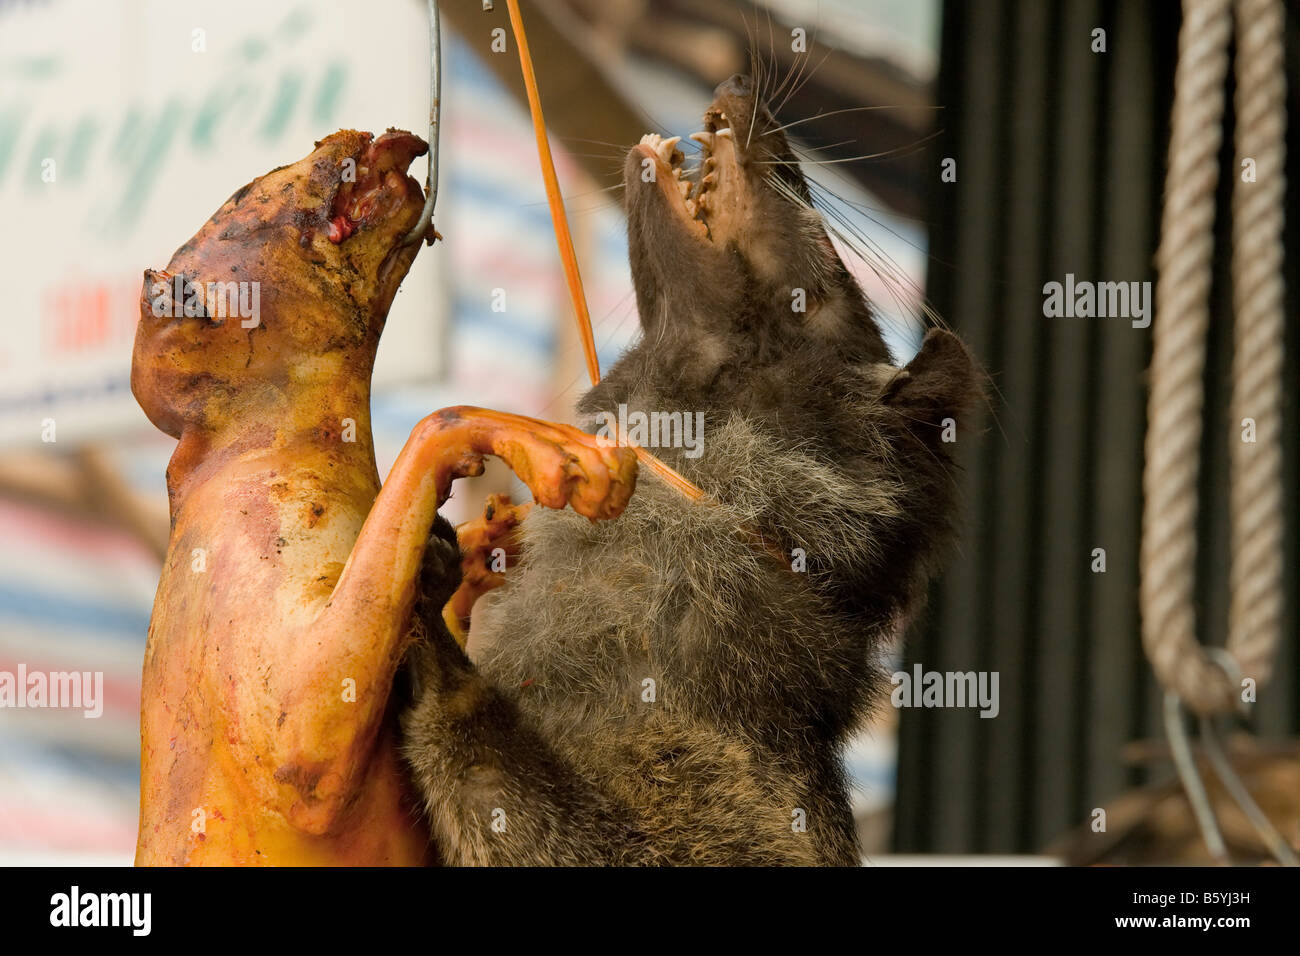 Vietnam statue chien pendu corde mur alimentaire Photo Stock